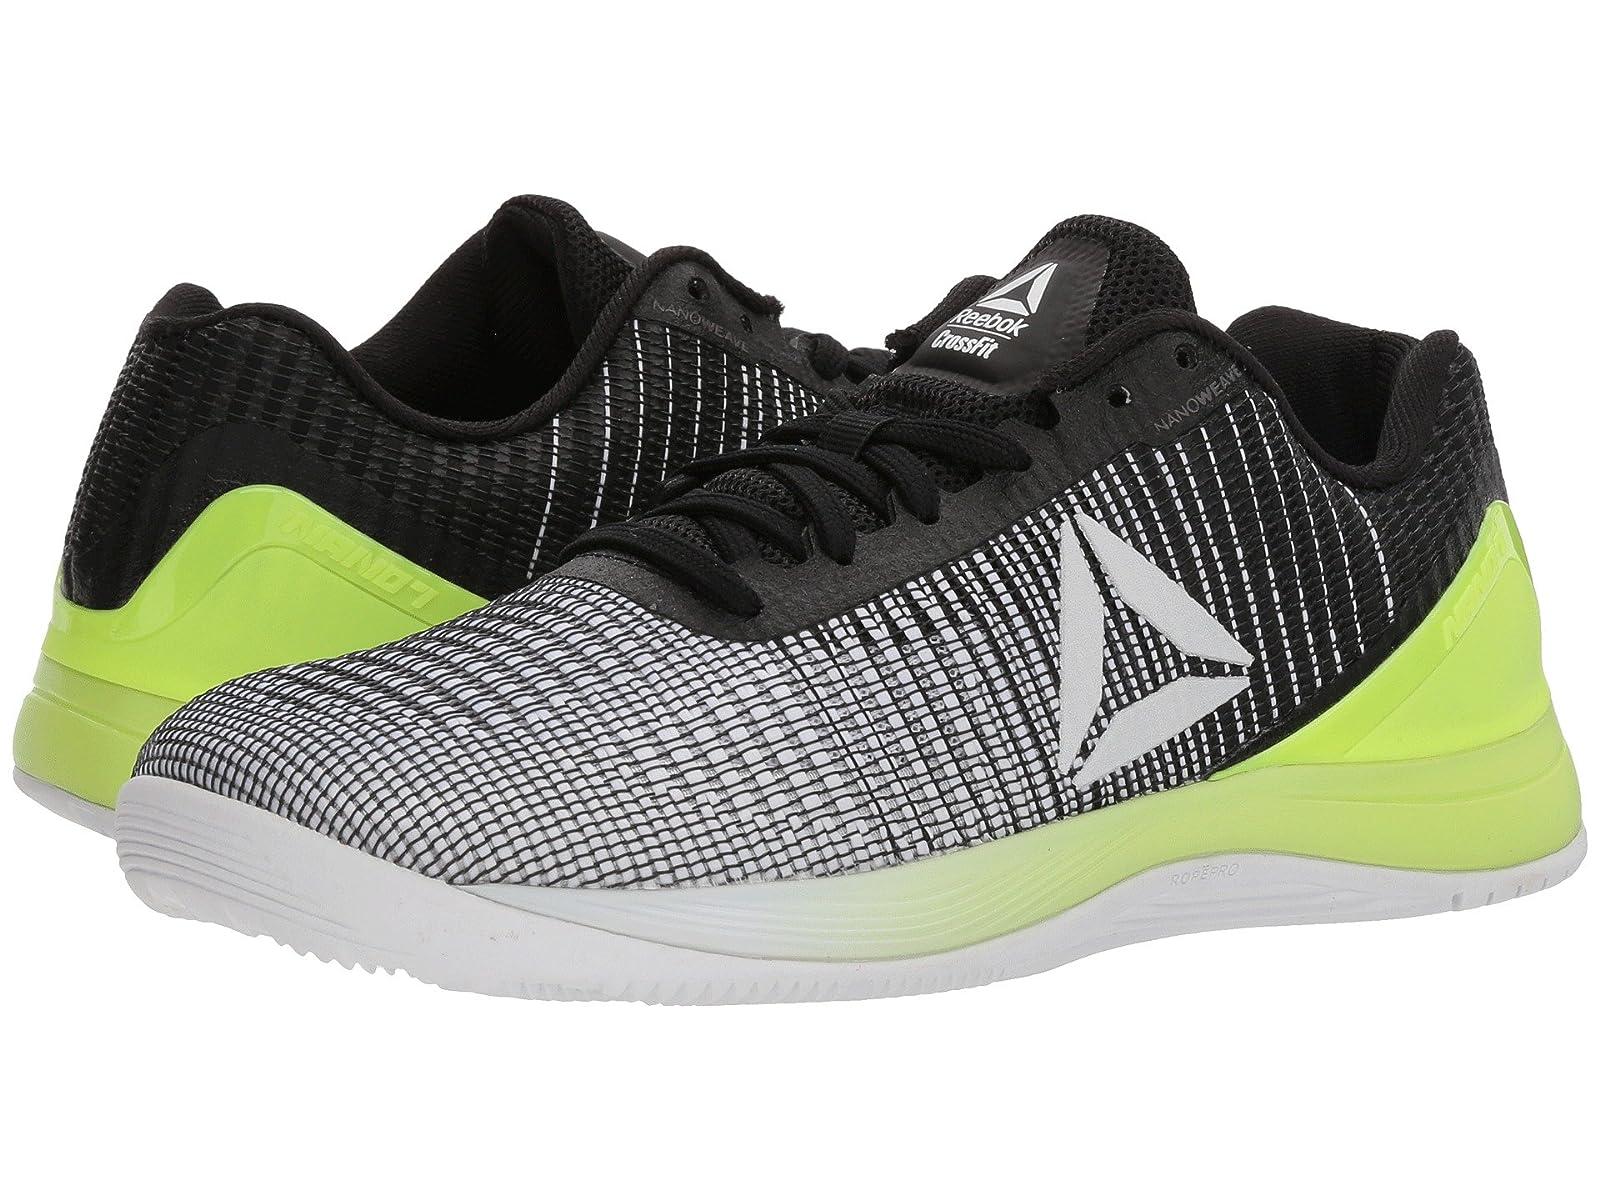 Reebok Crossfit Nano 7Cheap and distinctive eye-catching shoes